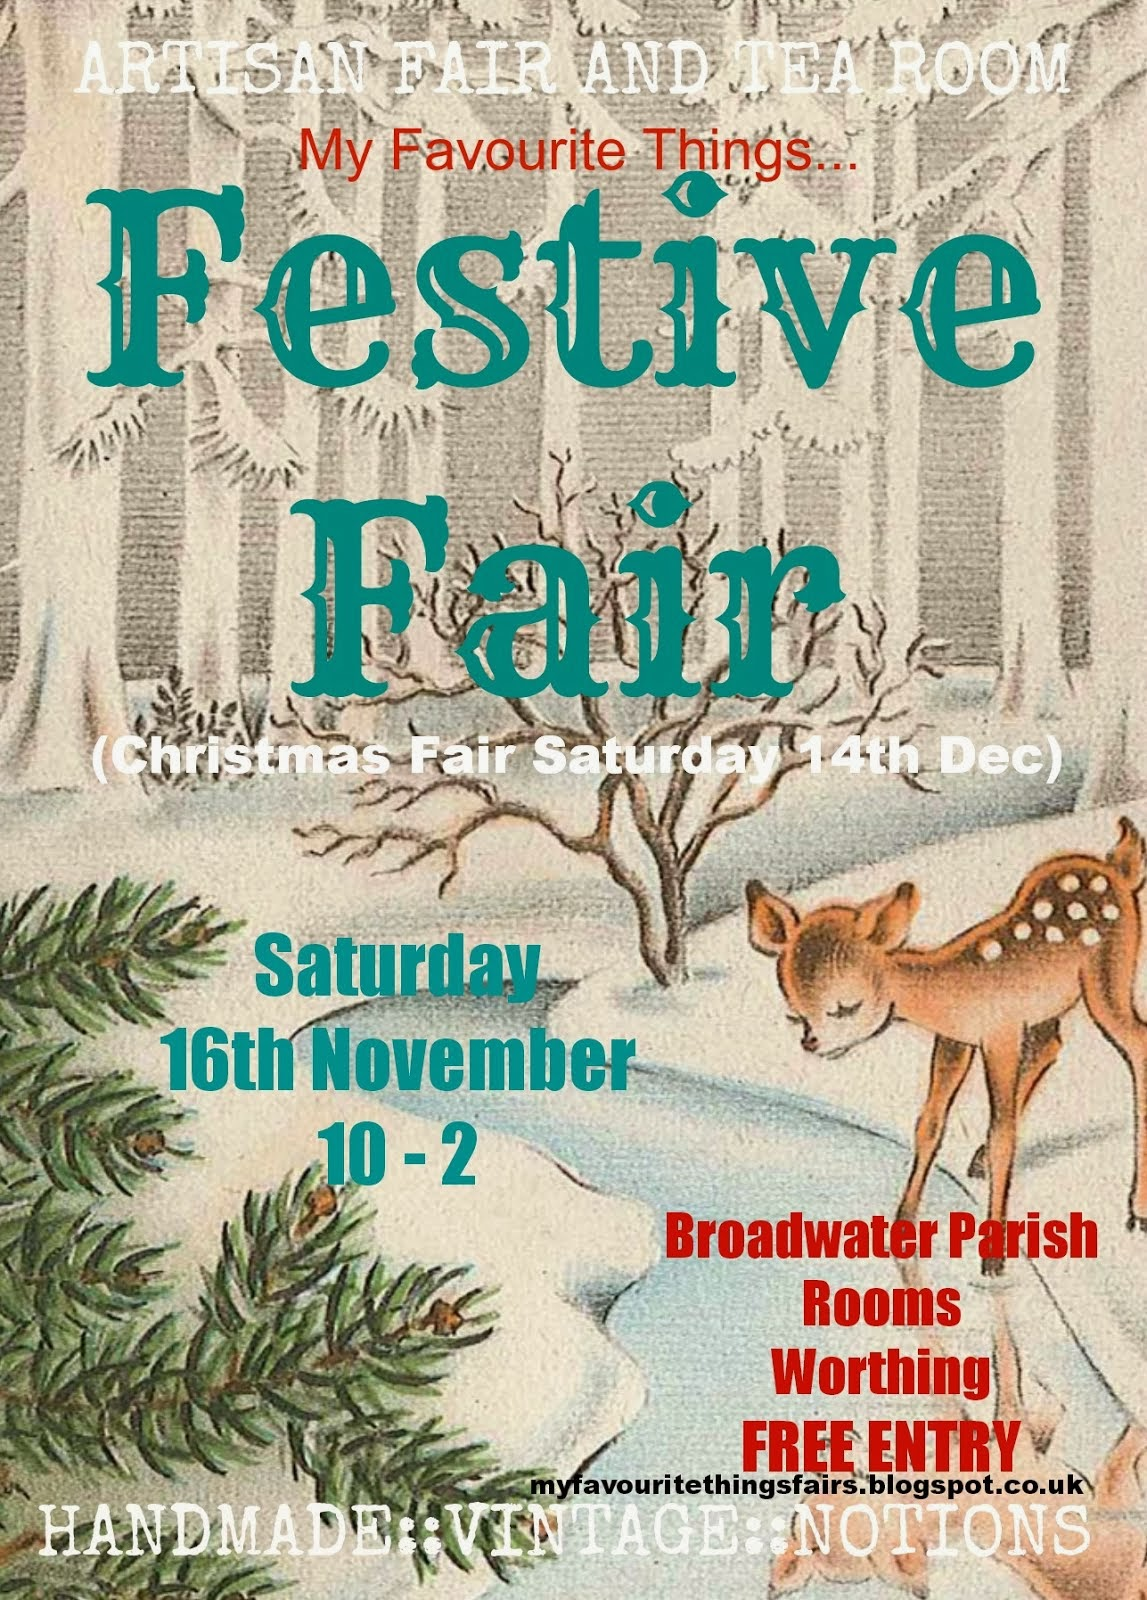 Festive fair 2013